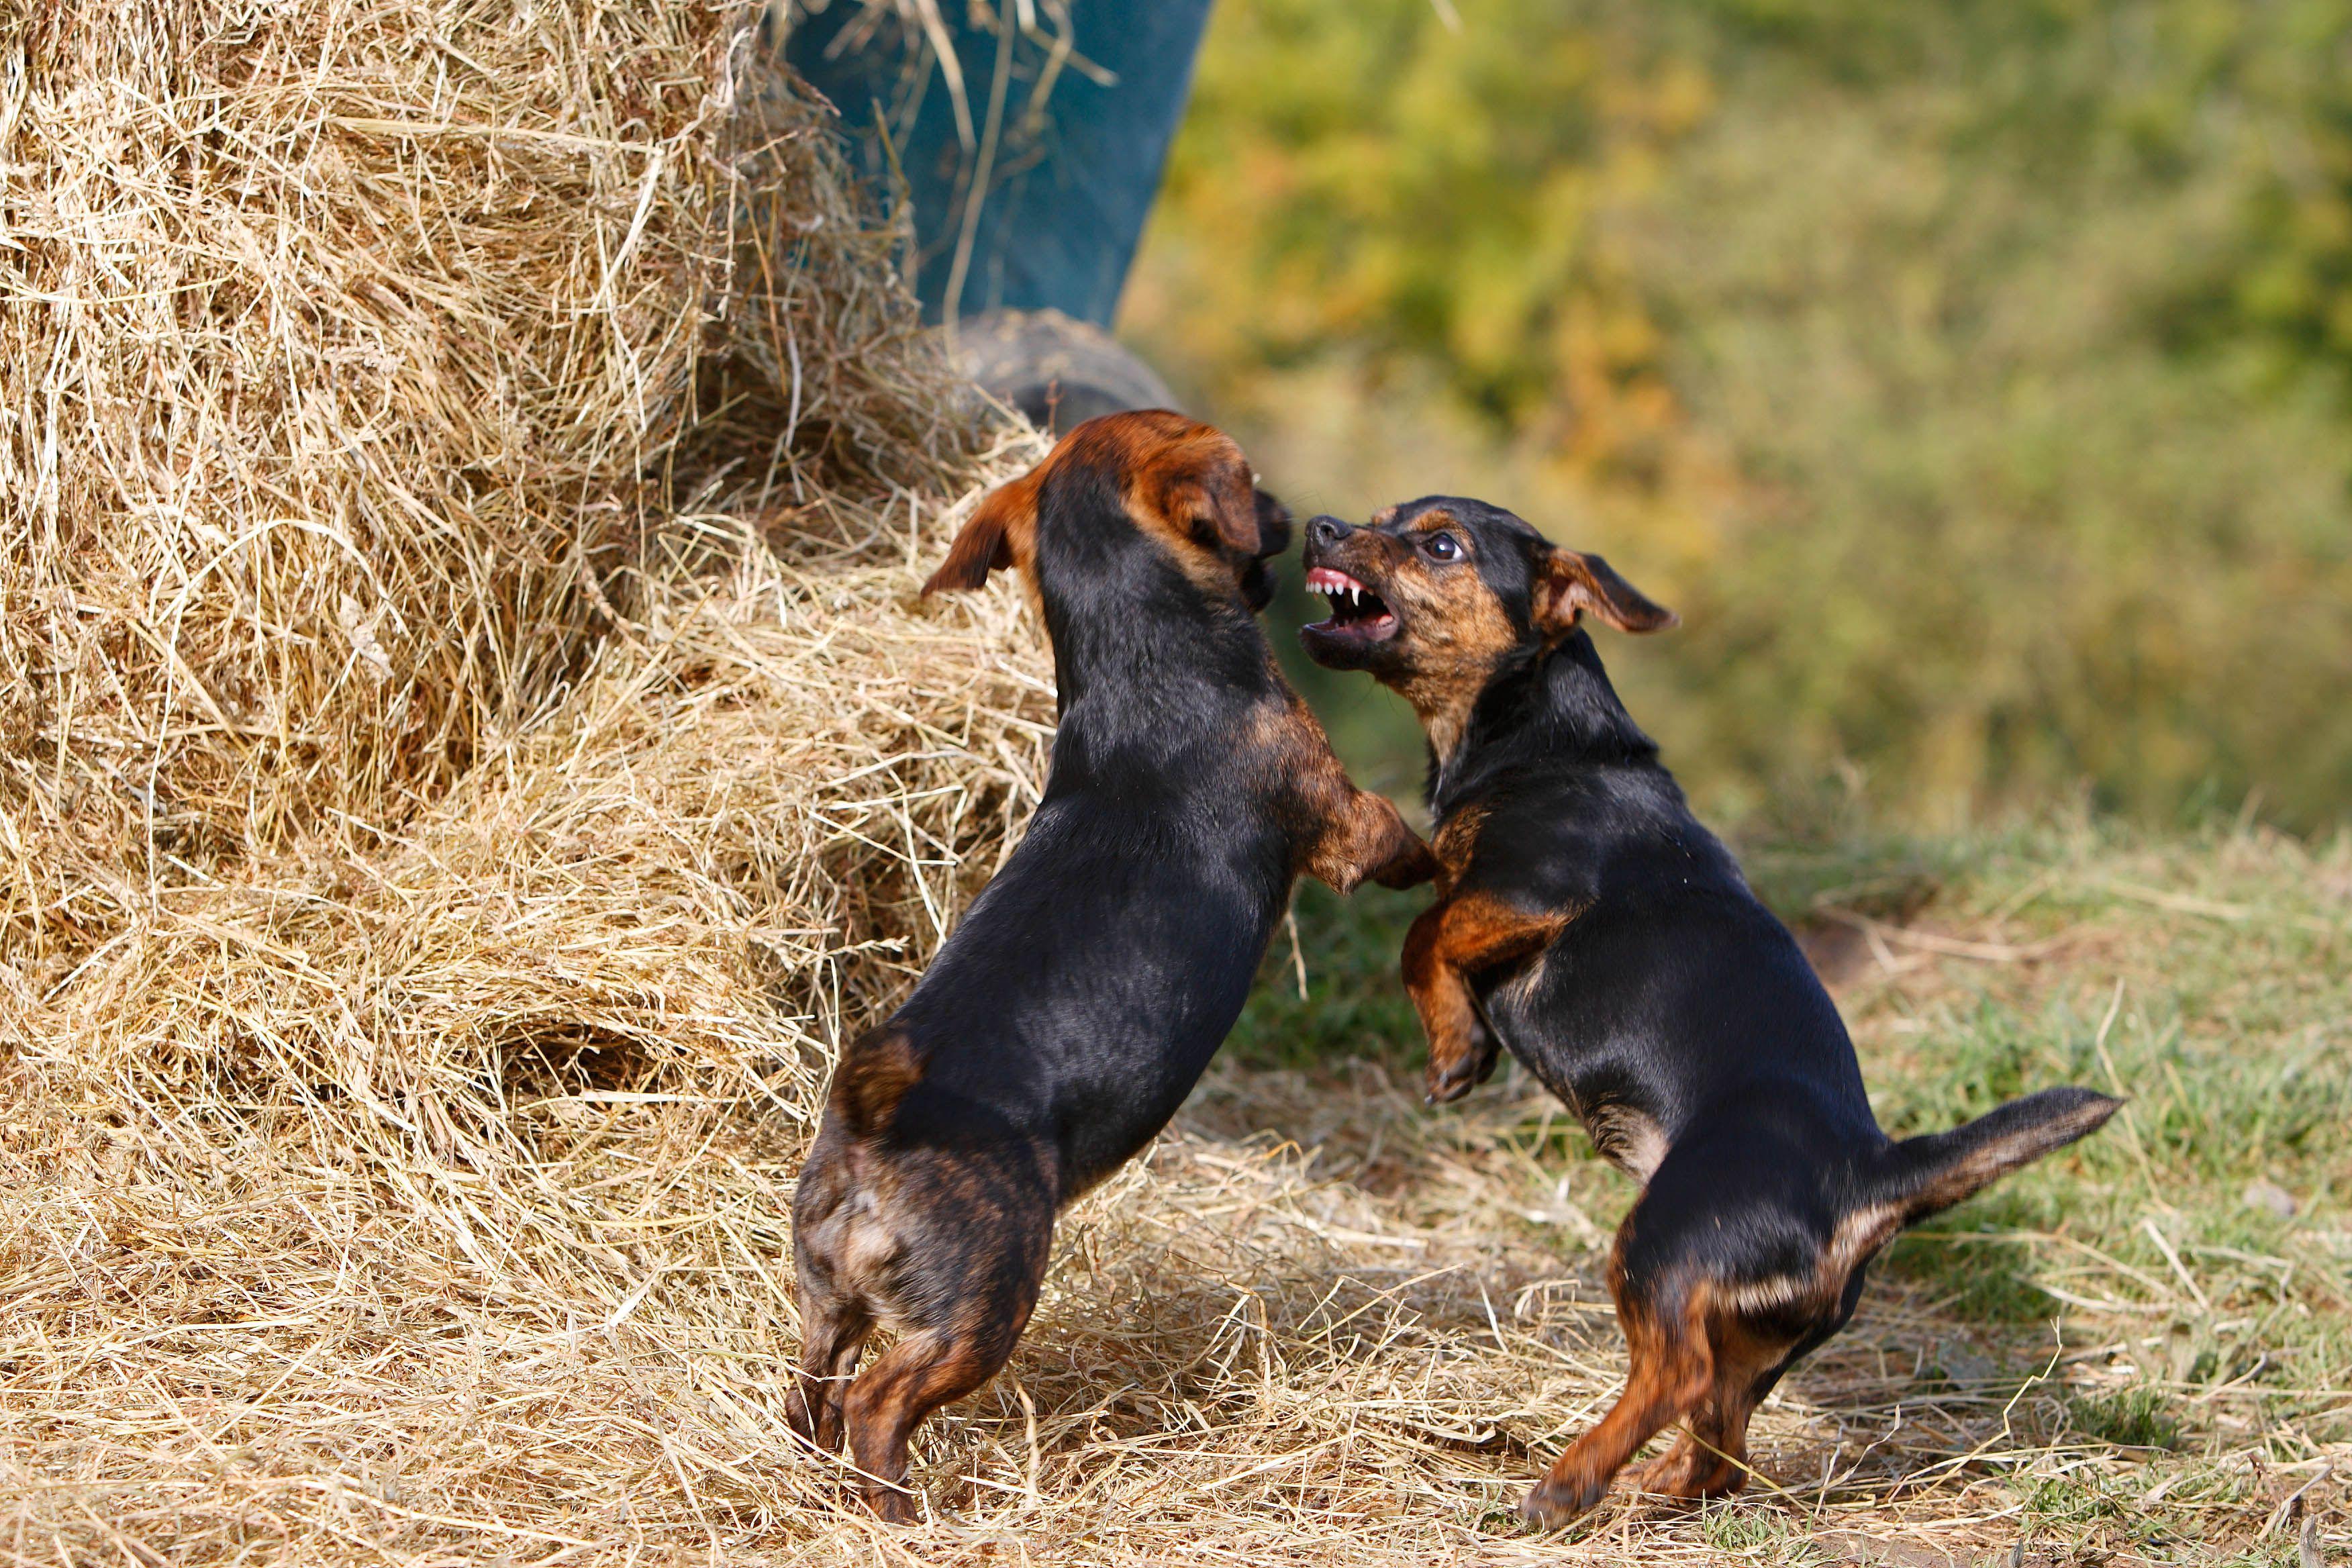 Cachorros peleando